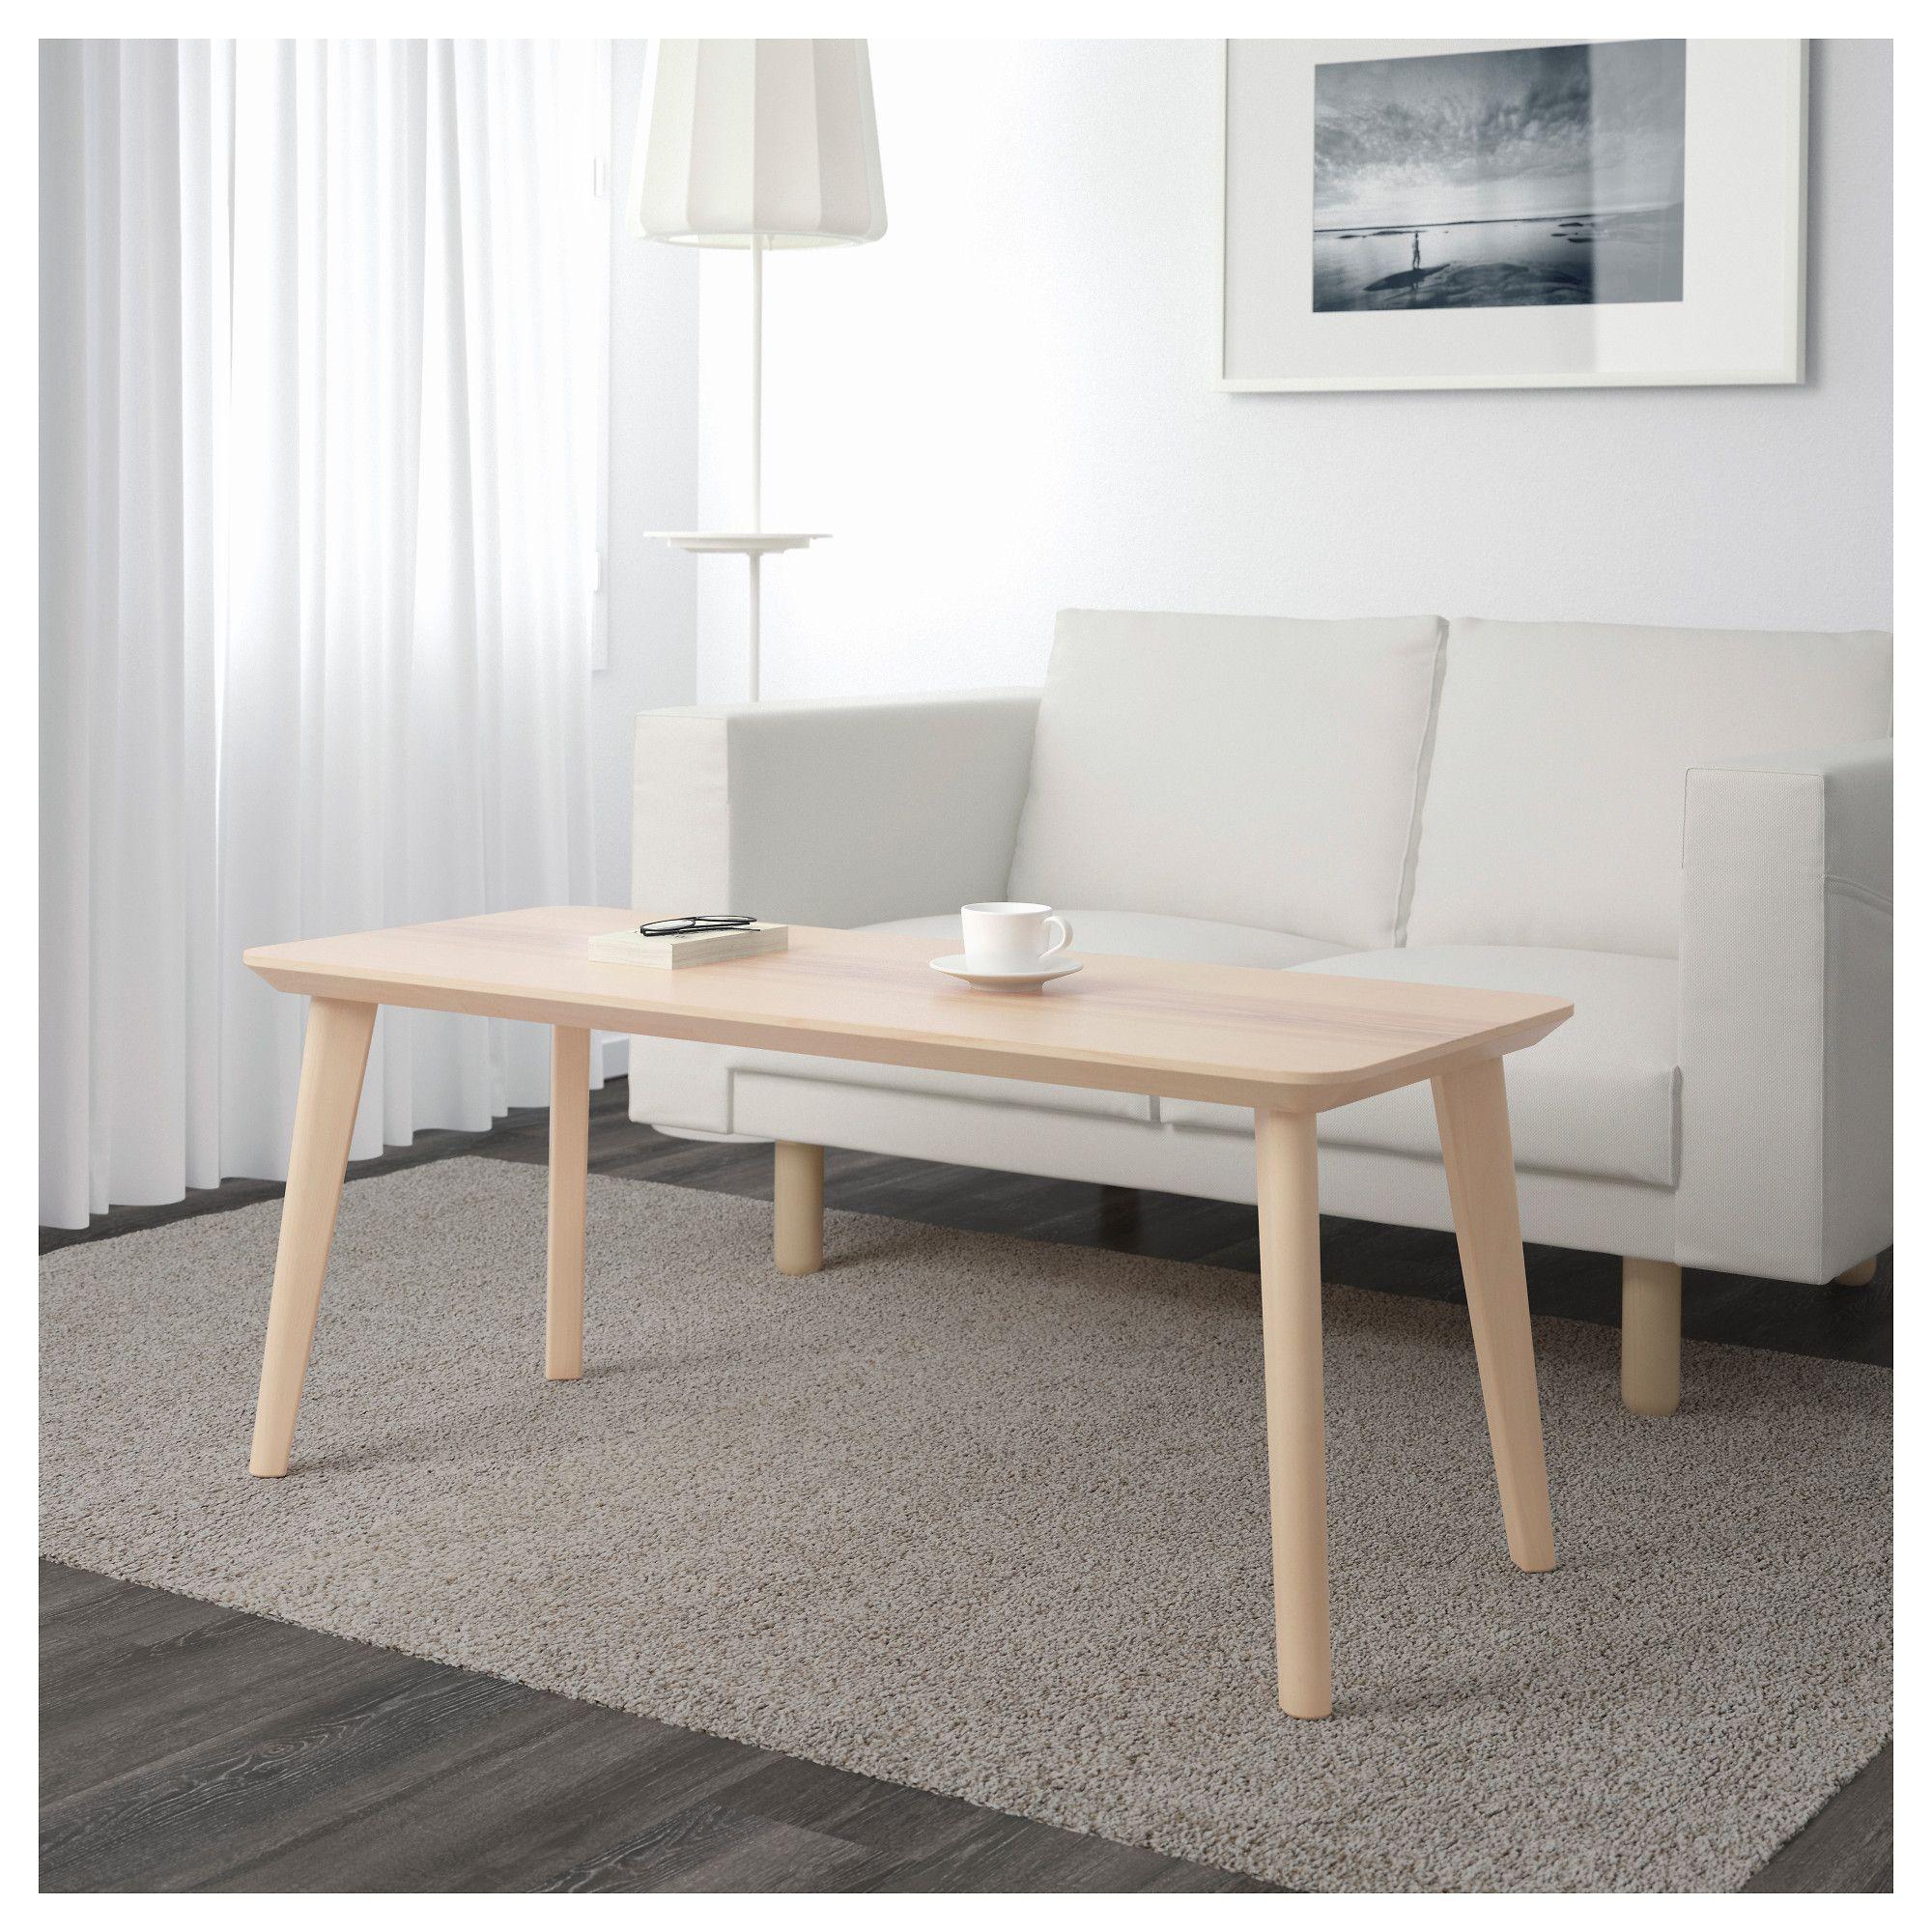 Ikea Rug Torrild: IKEA - LISABO Coffee Table Ash Veneer